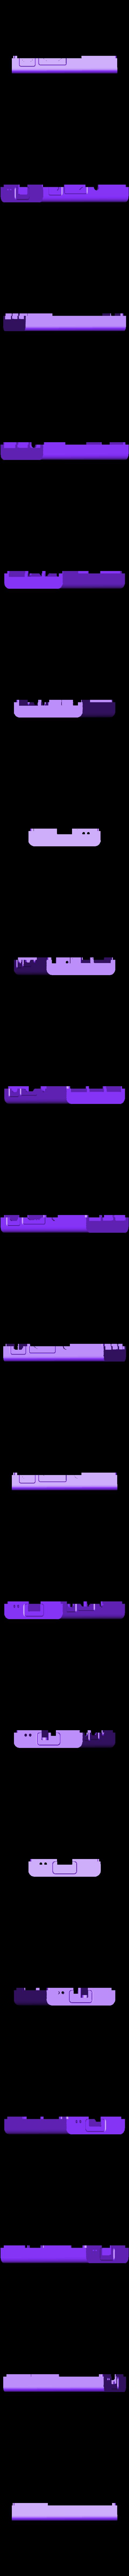 Raspberry_Pi_B%2B_Case_bottom.STL Download free STL file Raspberry Pi B+ Case With Fan • 3D printing object, Aralala